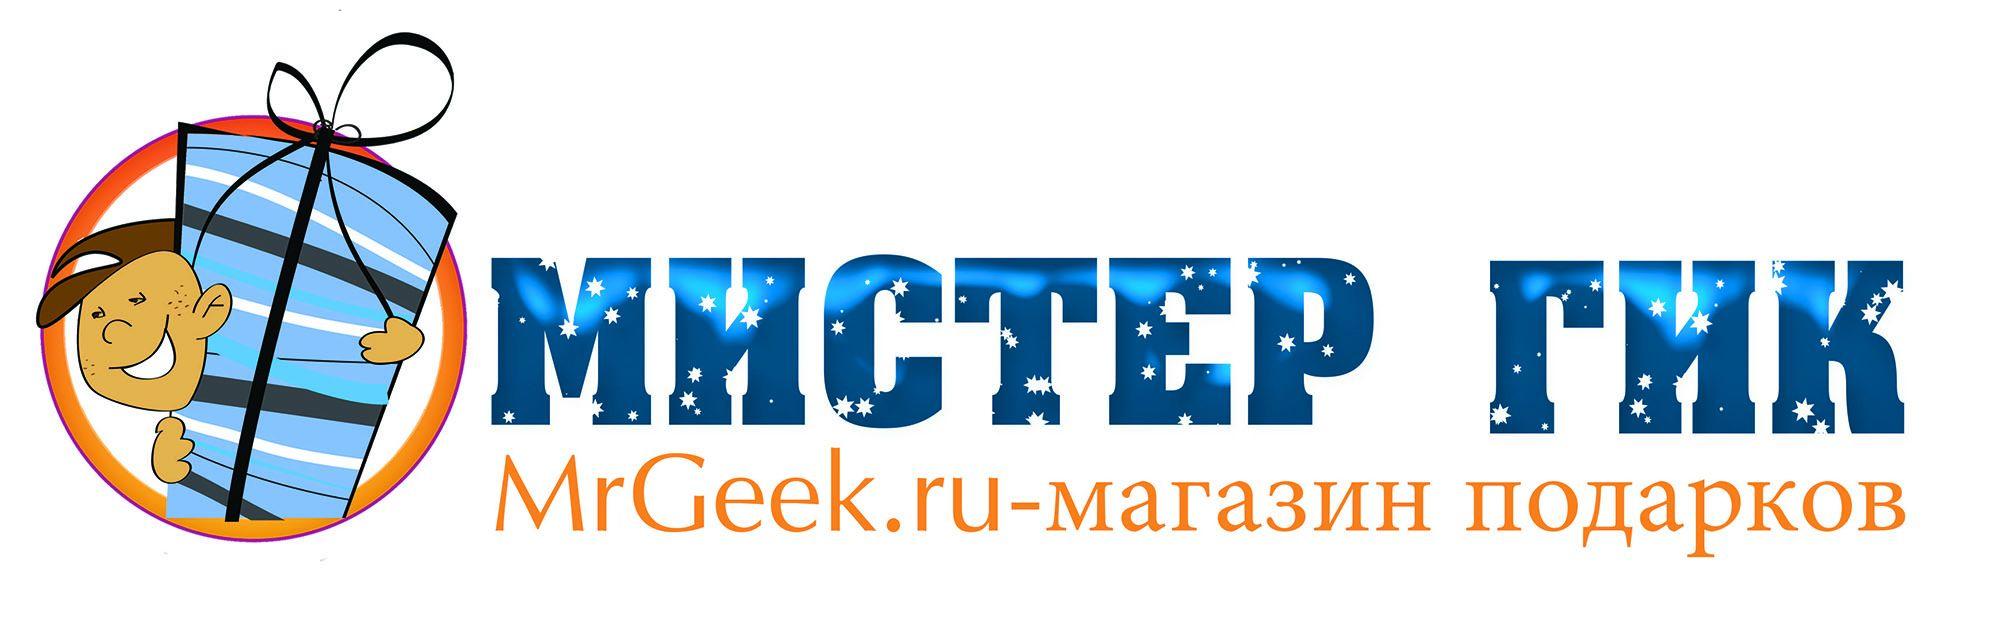 Логотип для магазина подарков - дизайнер Lilipysi4ek